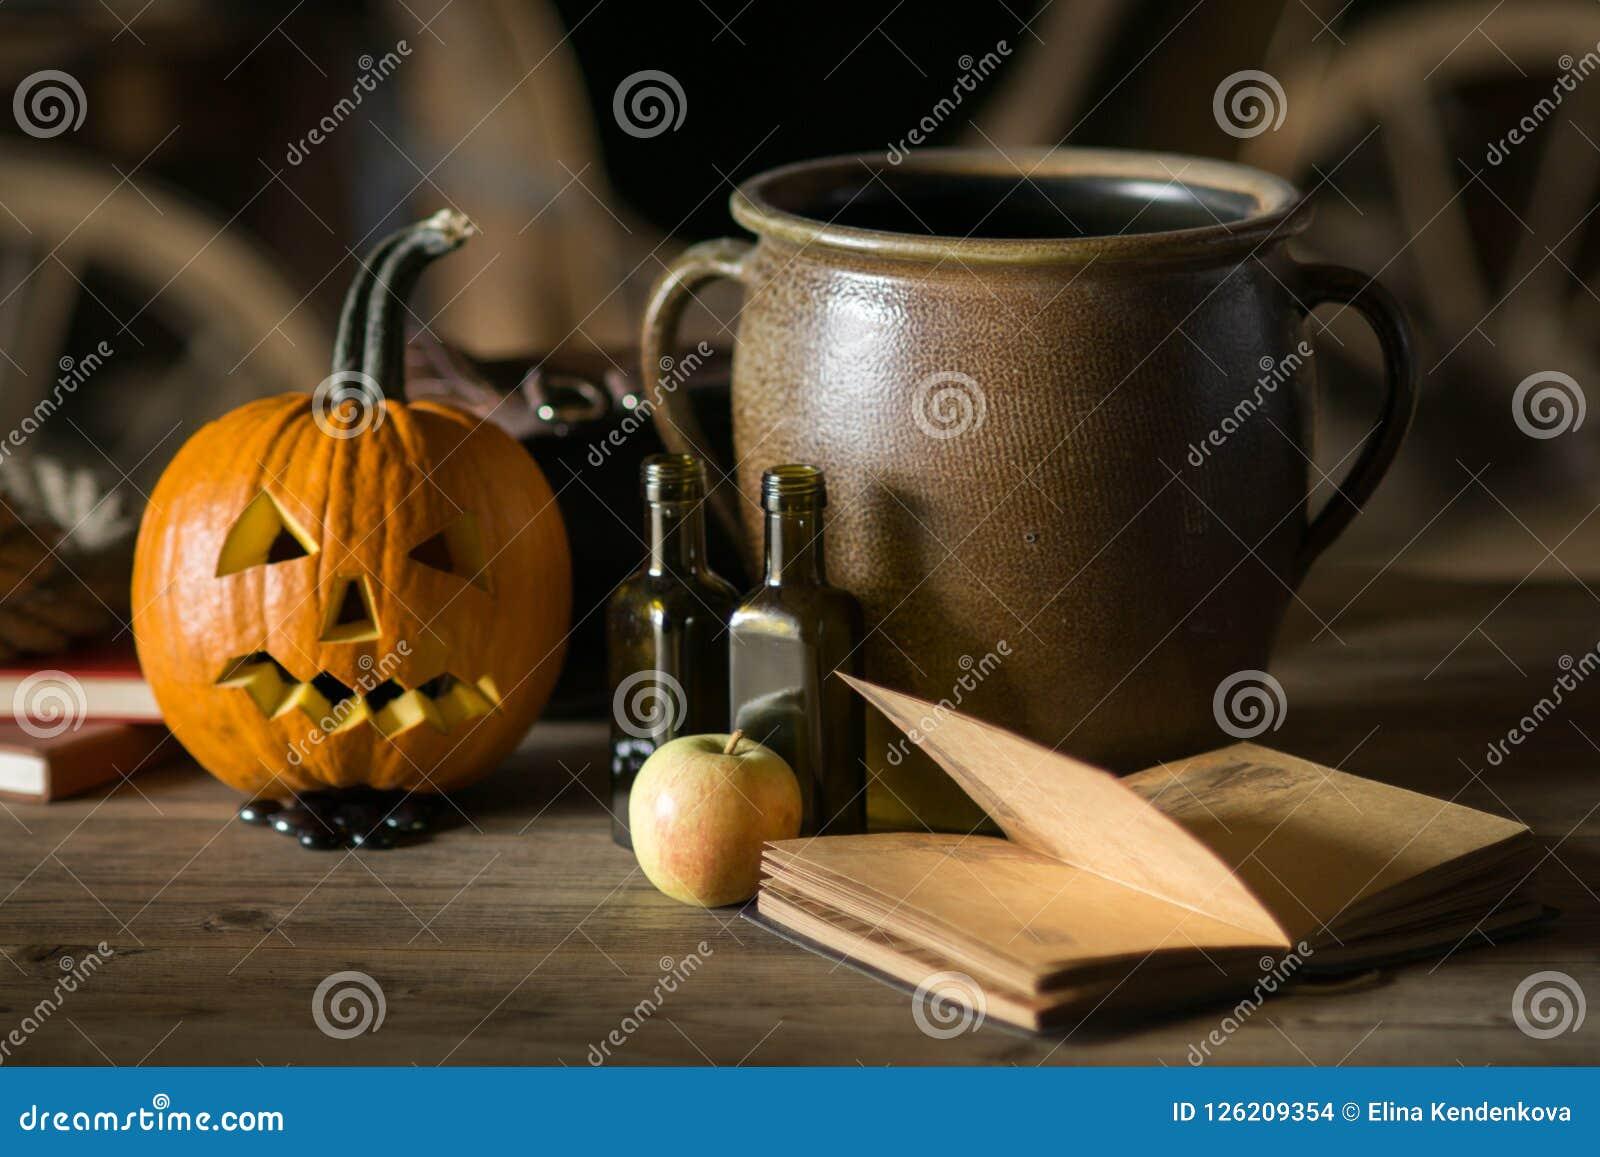 Still life with pumpkin face on halloween in october